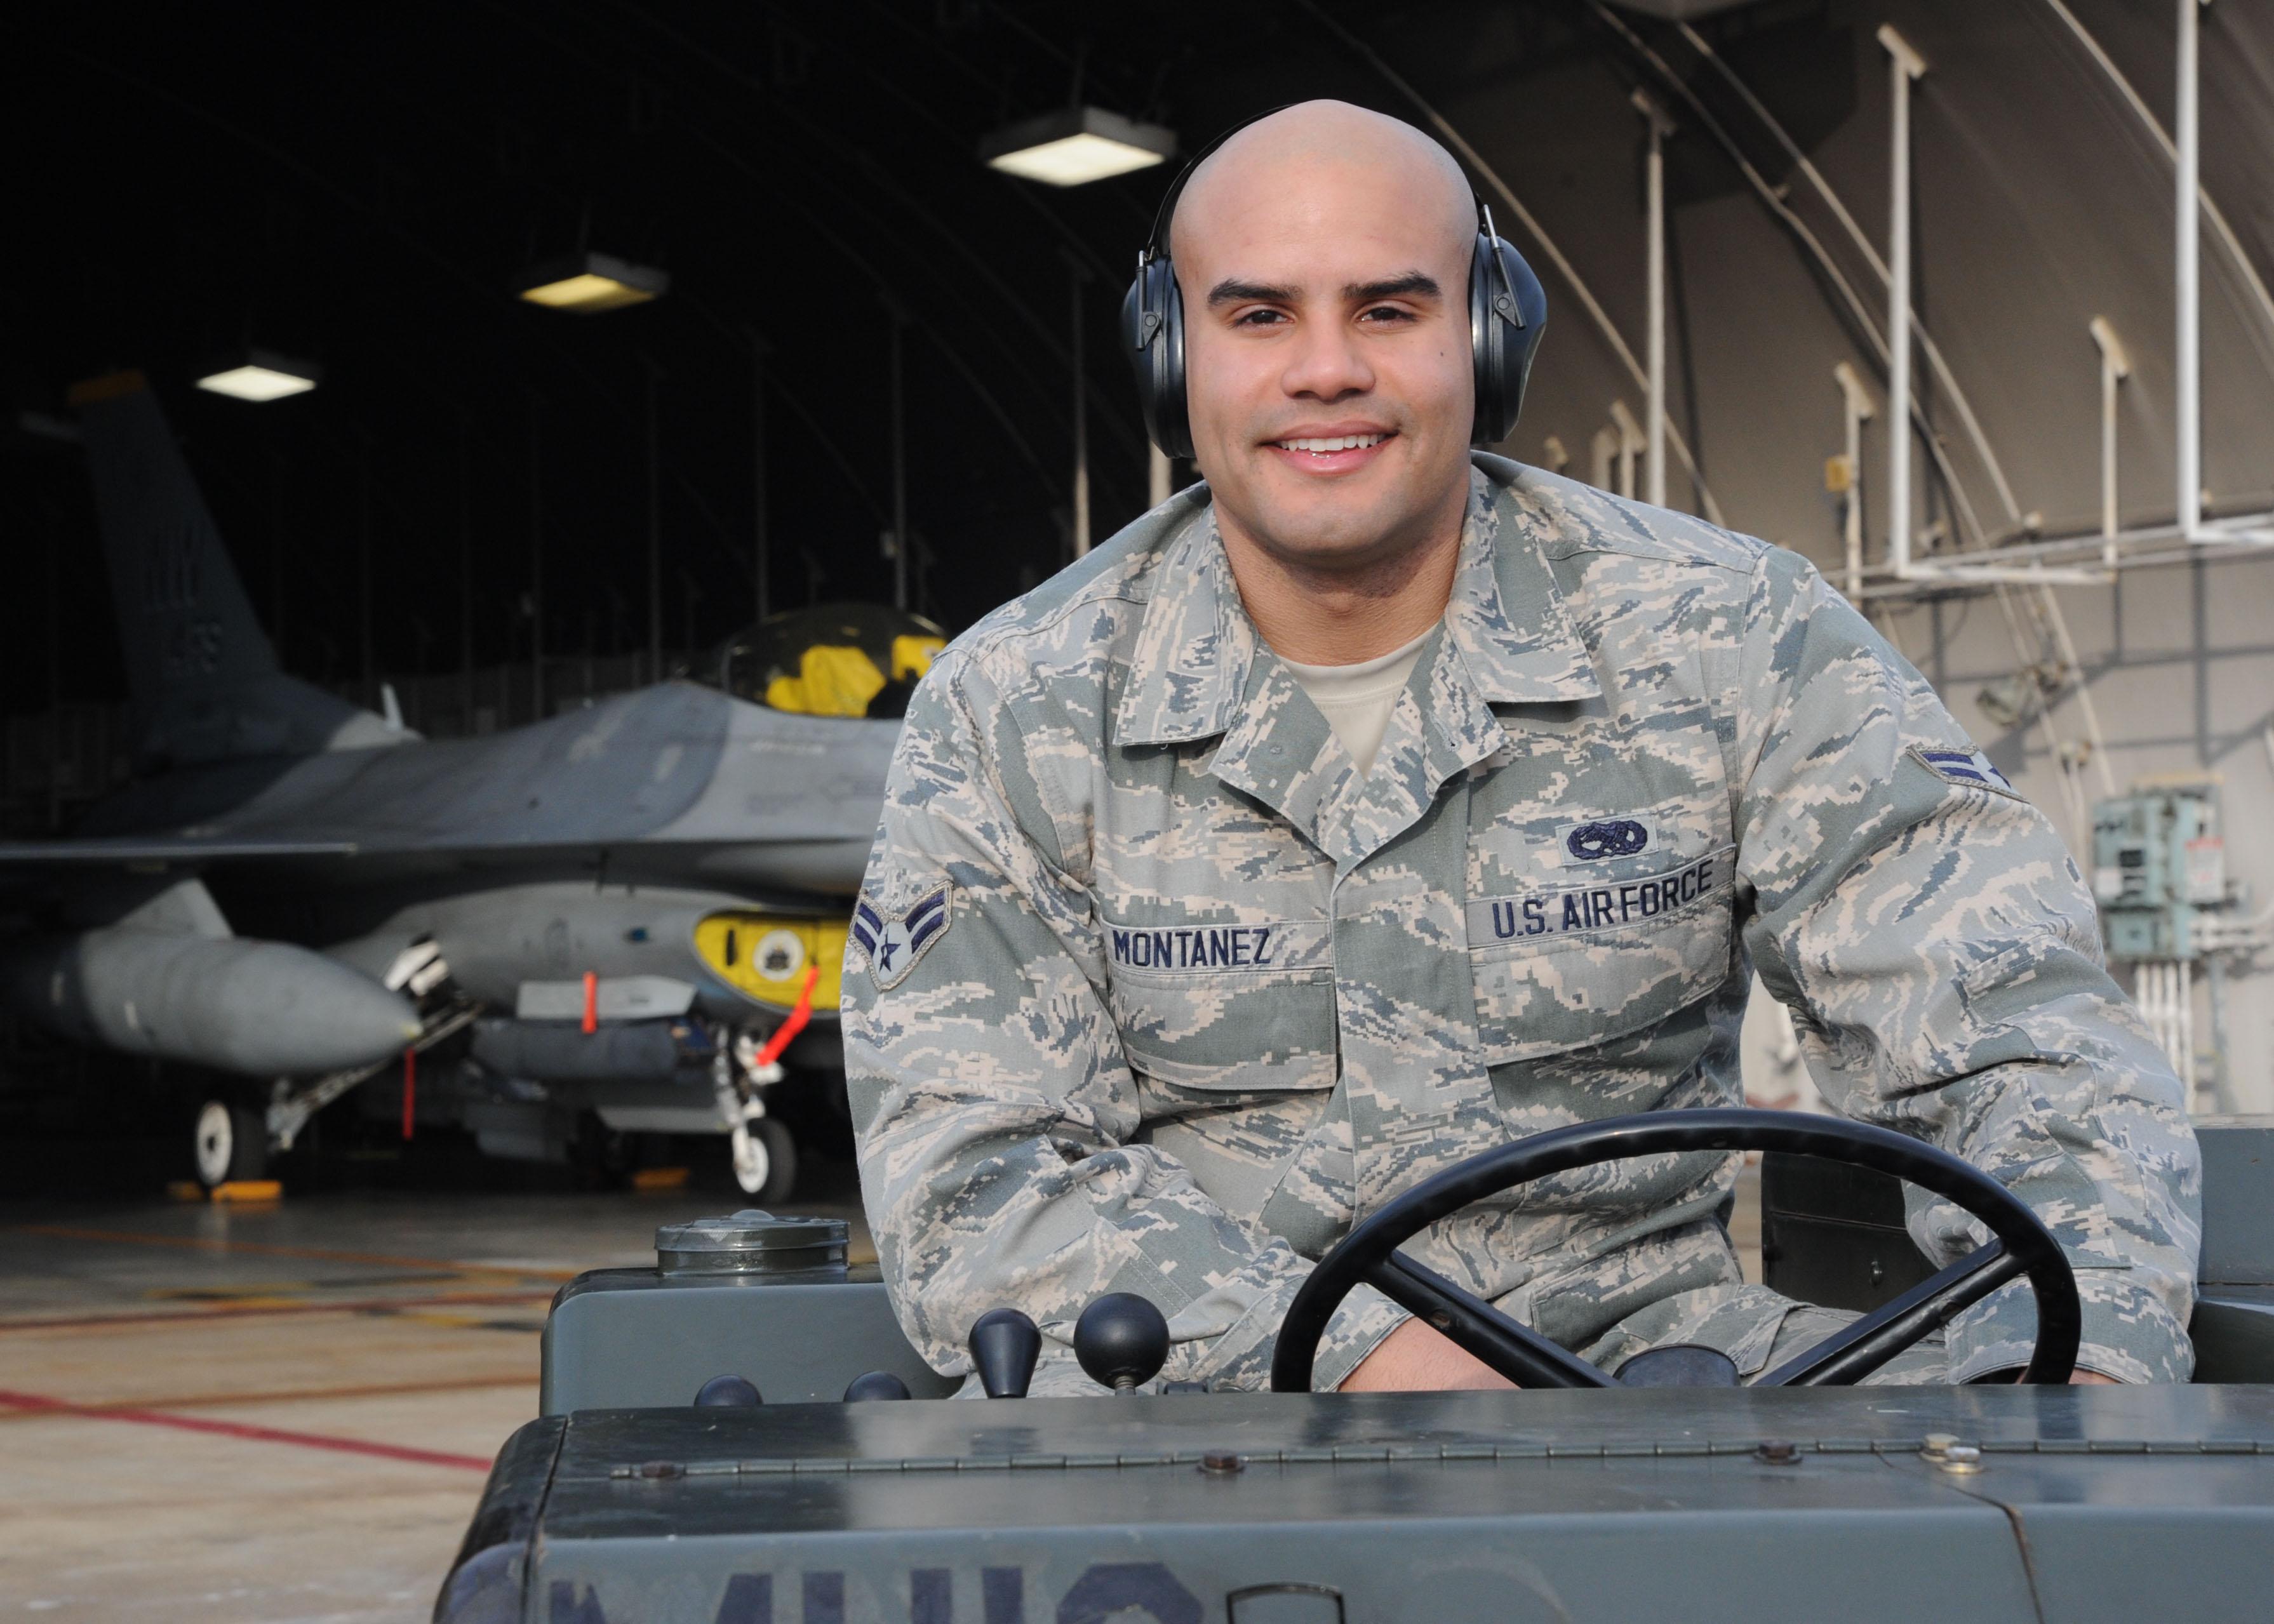 photos airman 1st class julian a montanez 14th aircraft maintenance unit aircraft armament systems apprentice